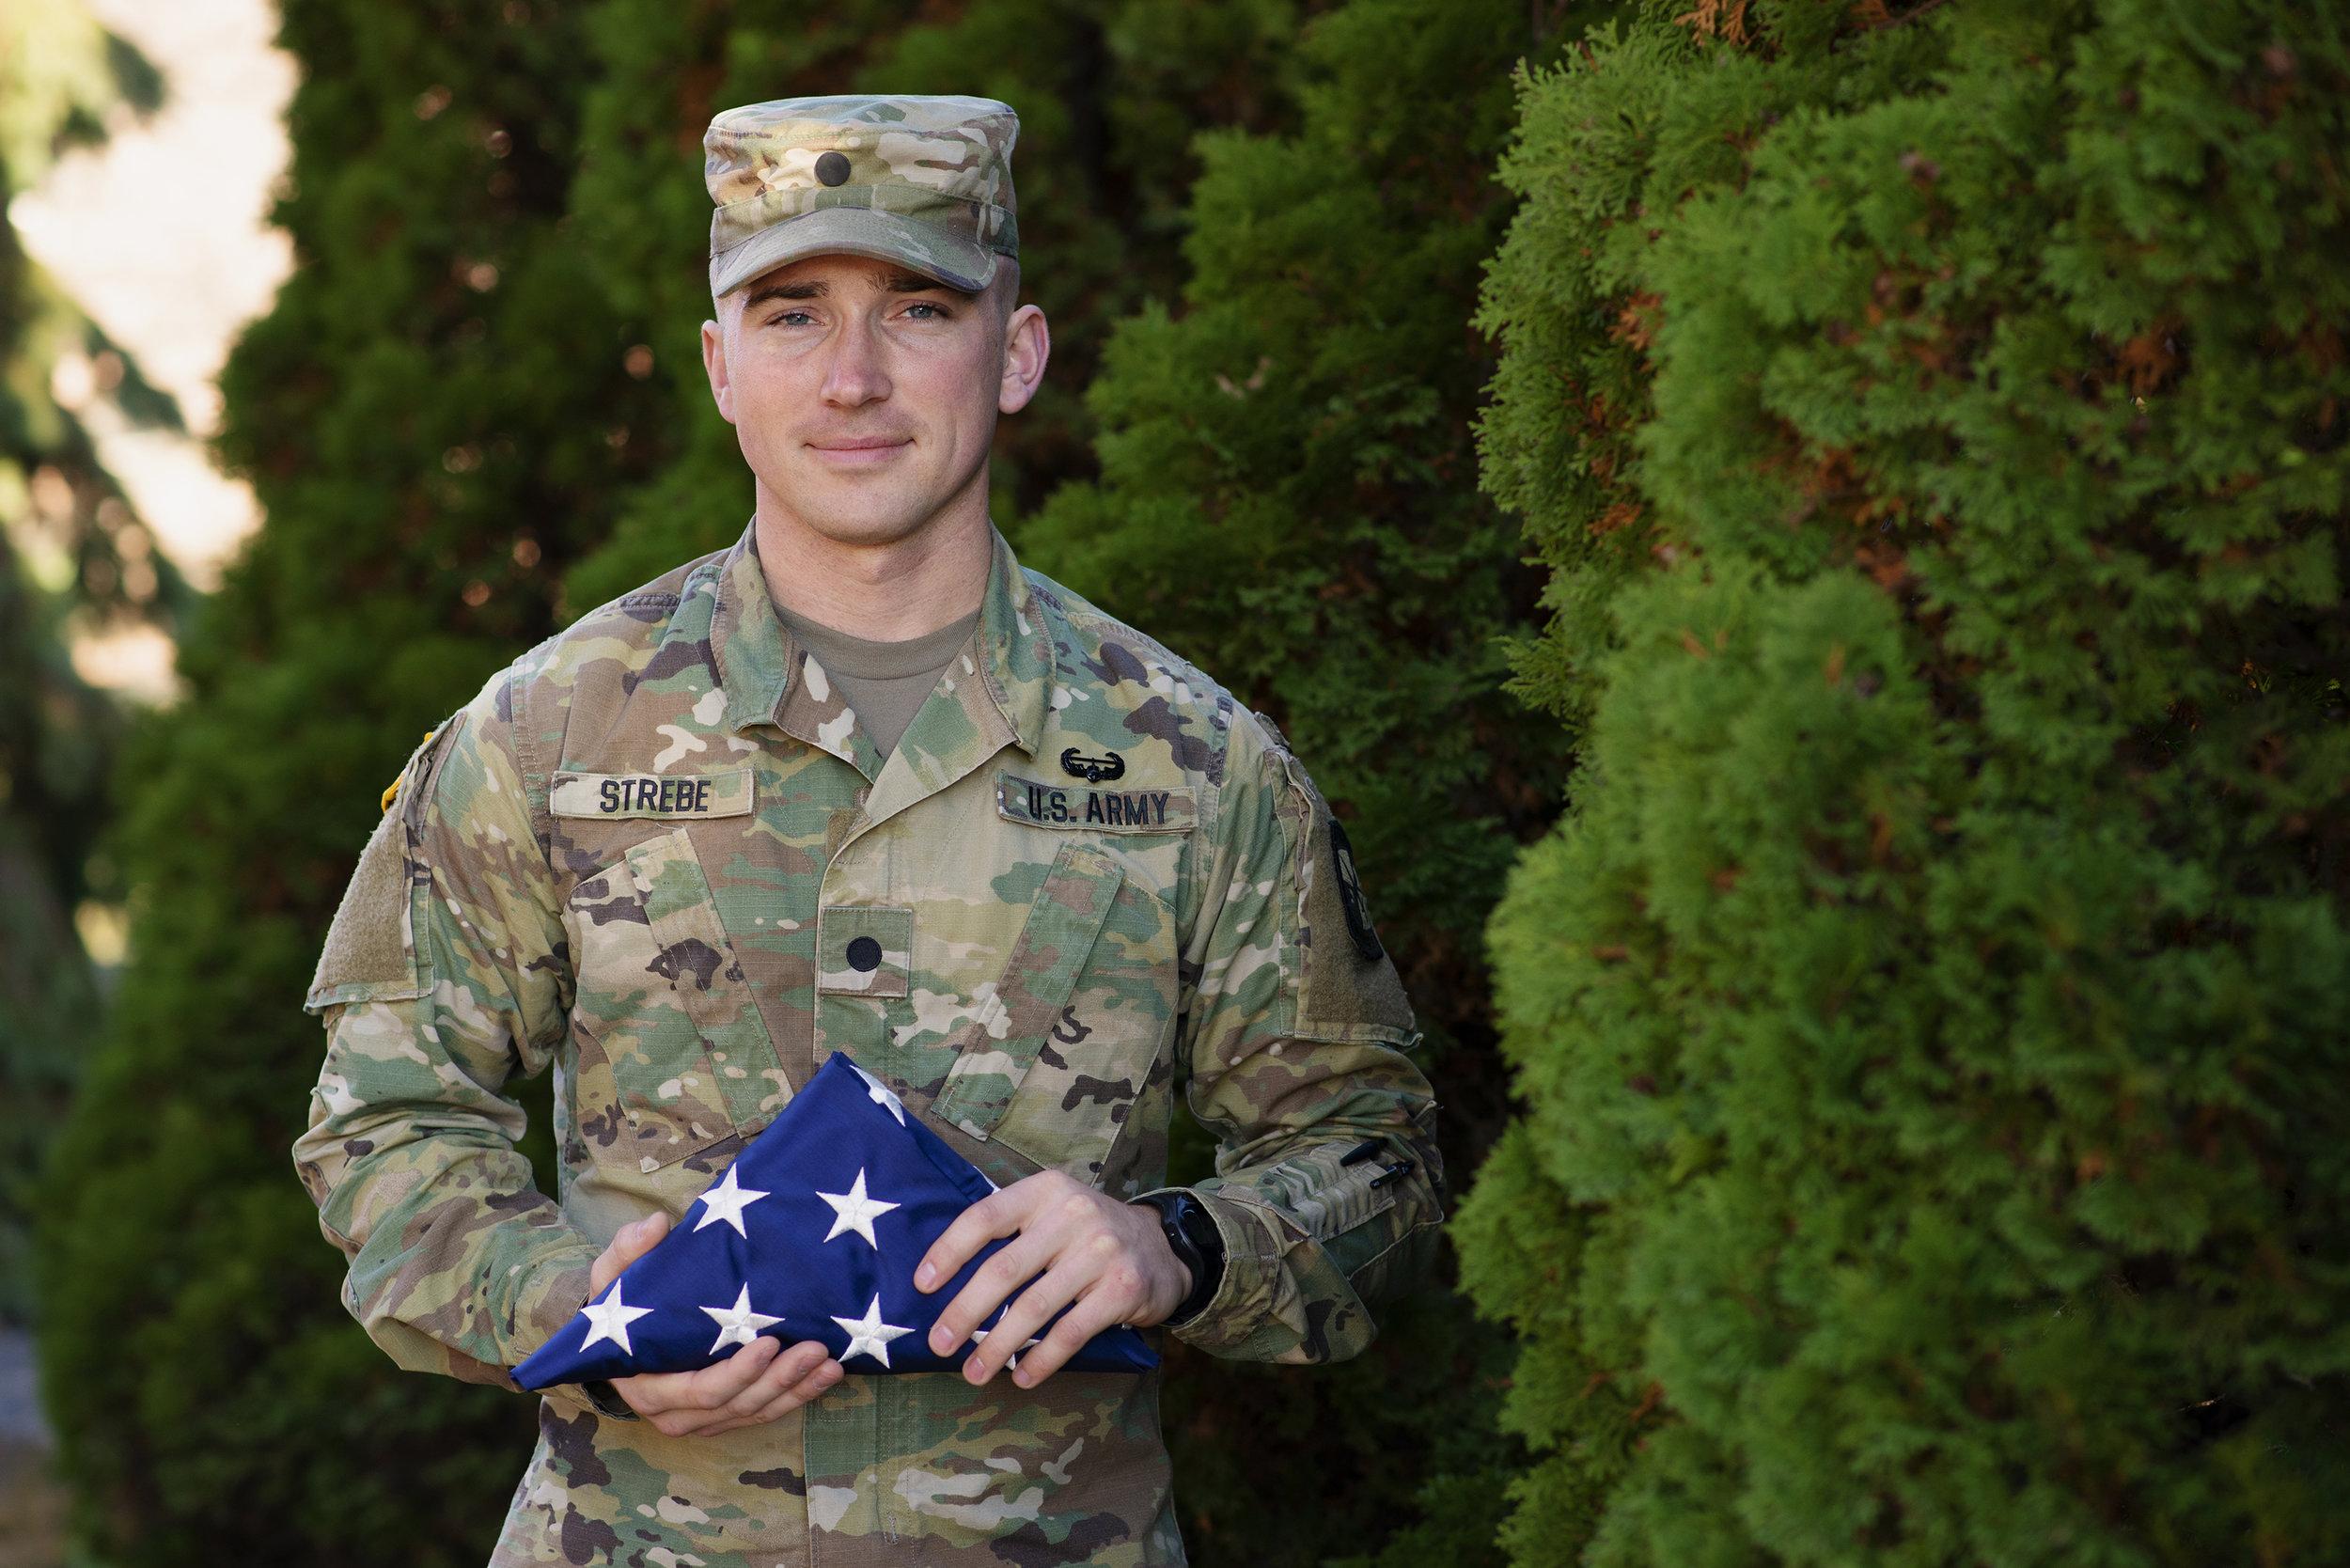 Veteran : Environmental Portrait done for UWRF - a celebration of Student Veterans attending school.